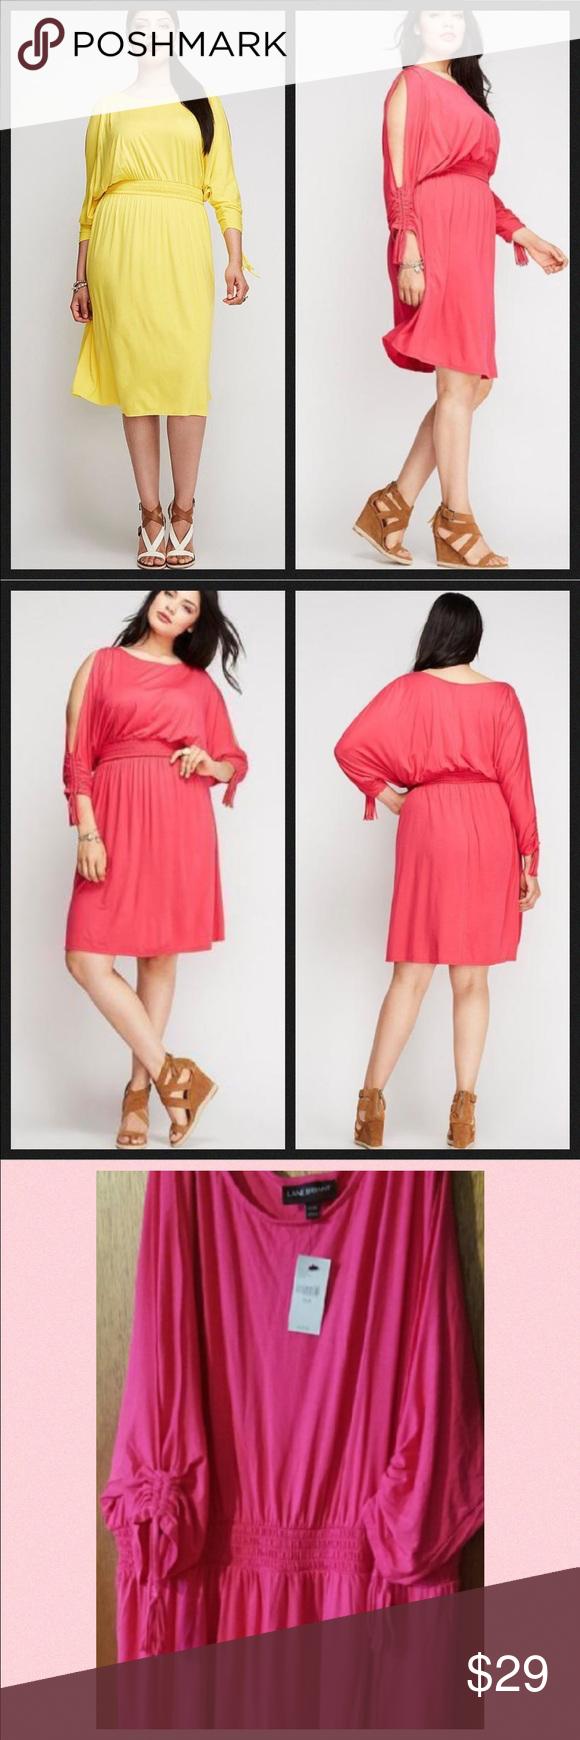 Hot pink color dress  NWT  Lane Bryant Hot Pink Cold Shoulder Dress  Shoulder dress